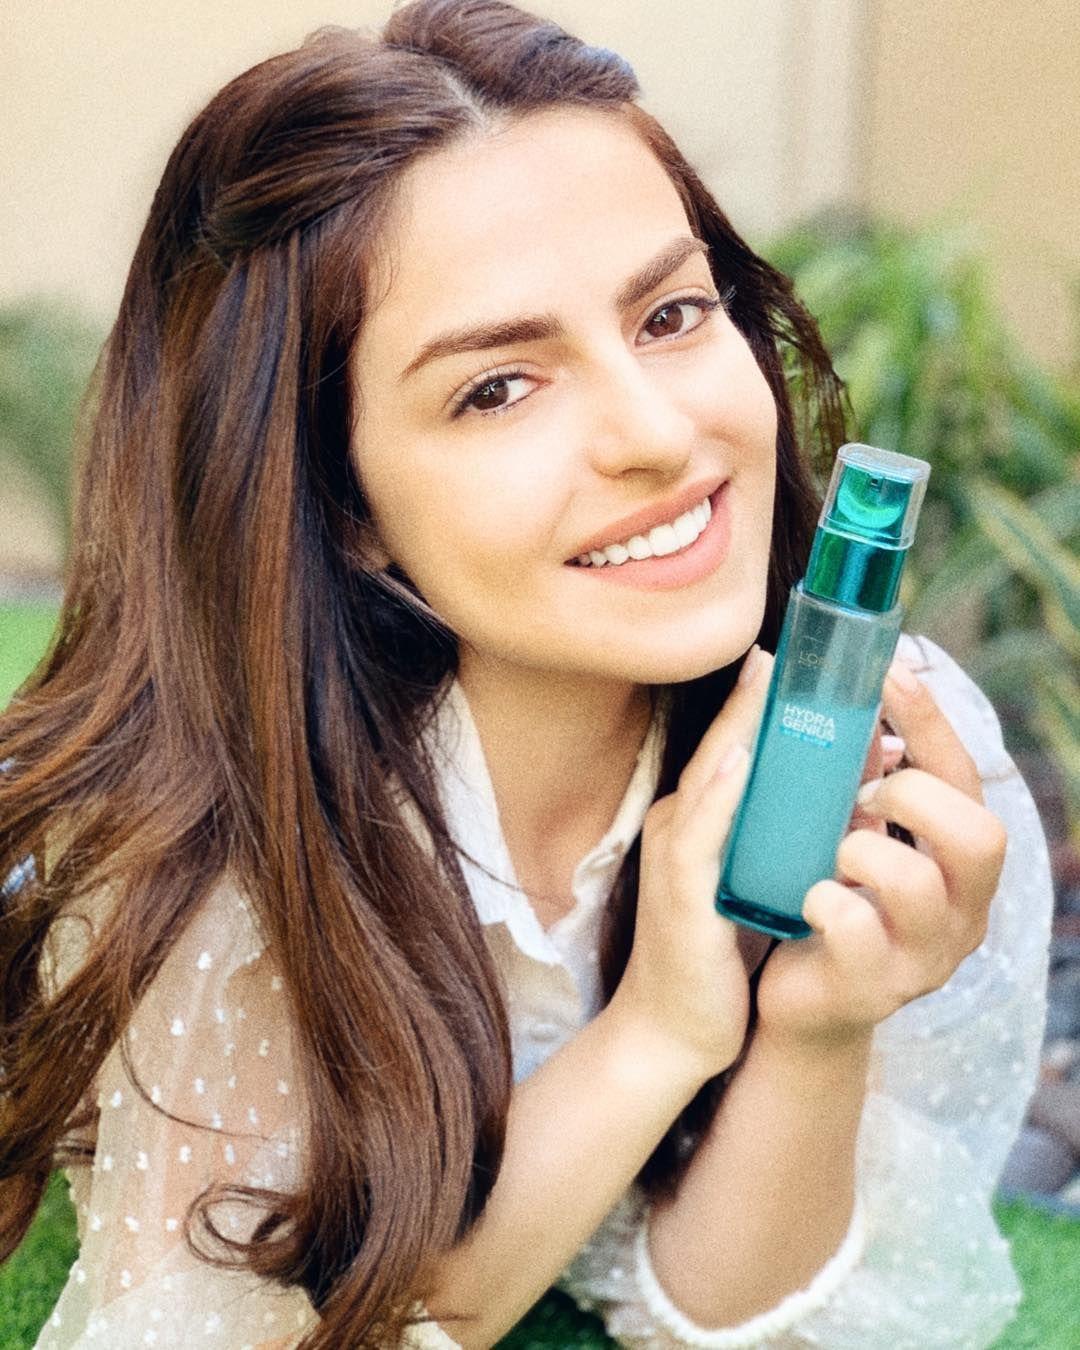 Safa Srour صفا سرور On Instagram Skincare Or Makeup Using Hydra Genius Moisturizer For 72hr Hydration Lorealskin صبايا شو بت Hair Styles Hair Beauty